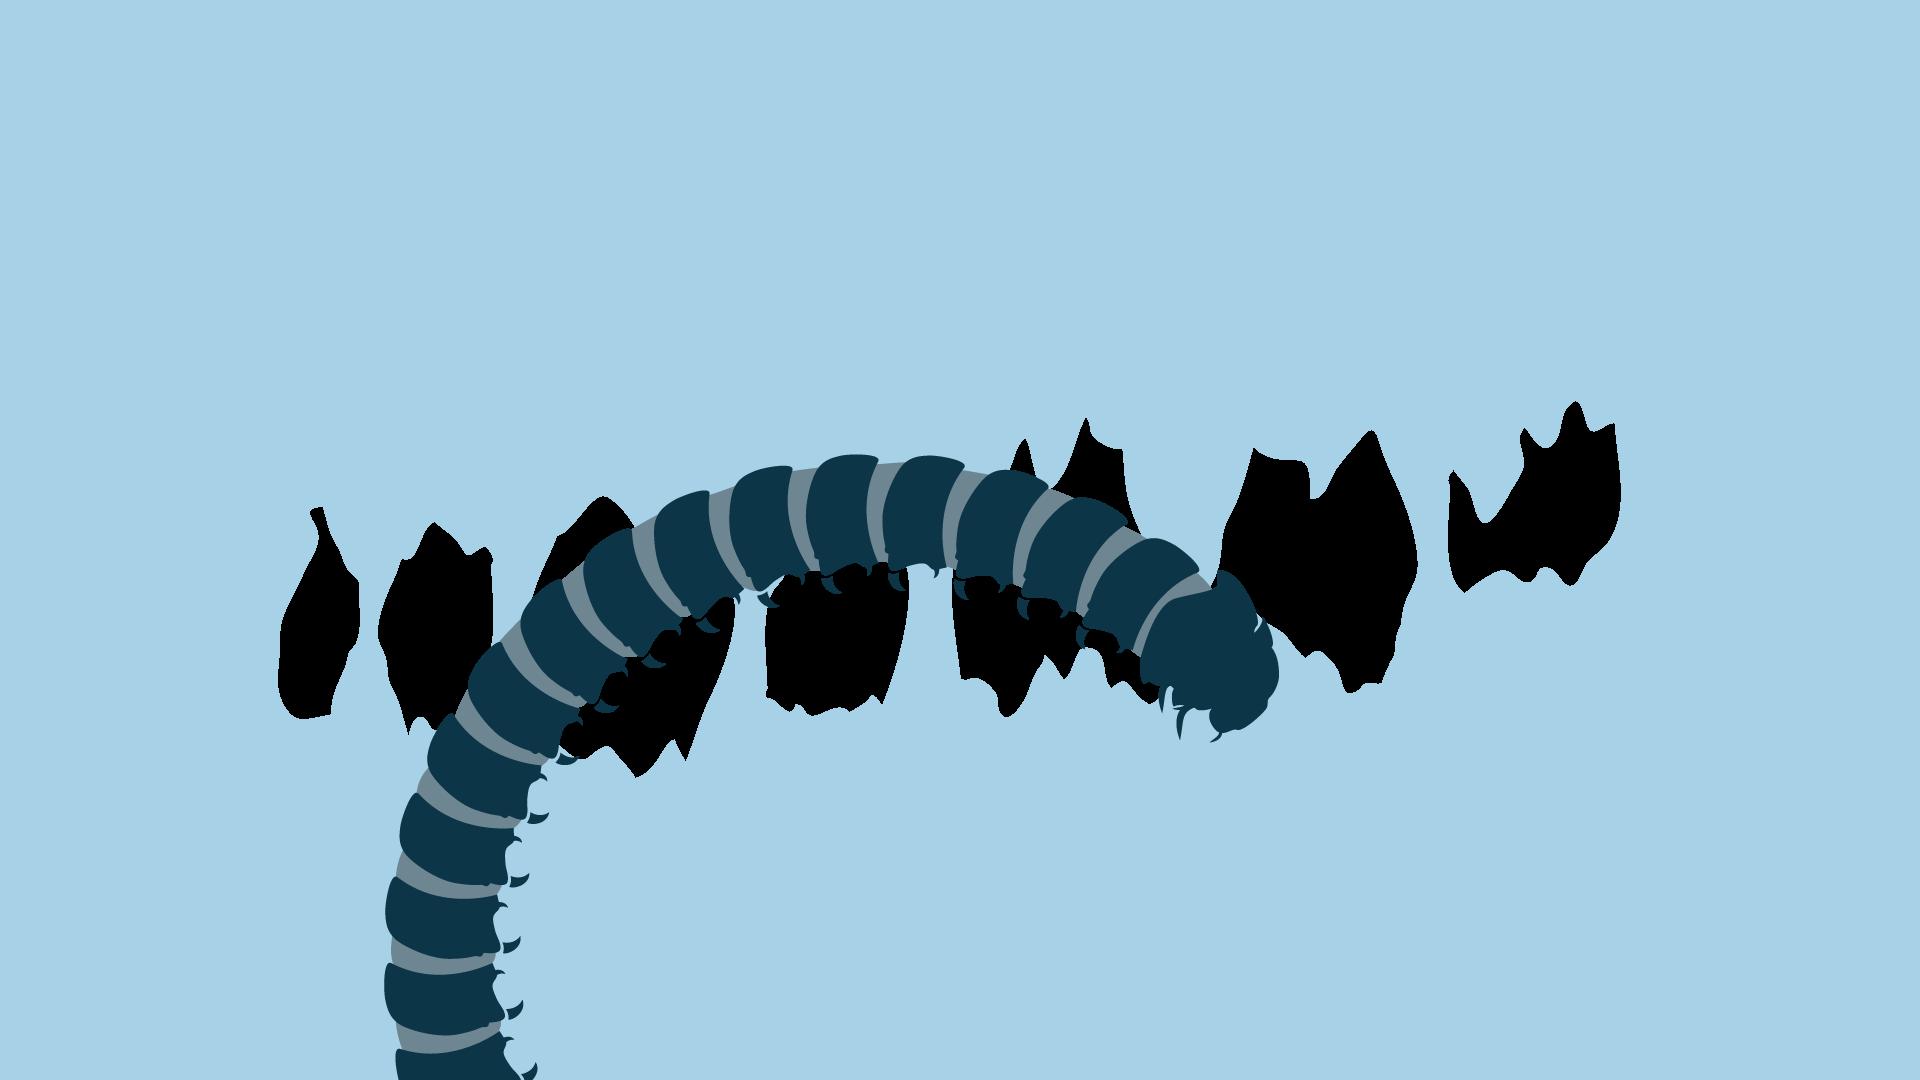 lvl1-01.png